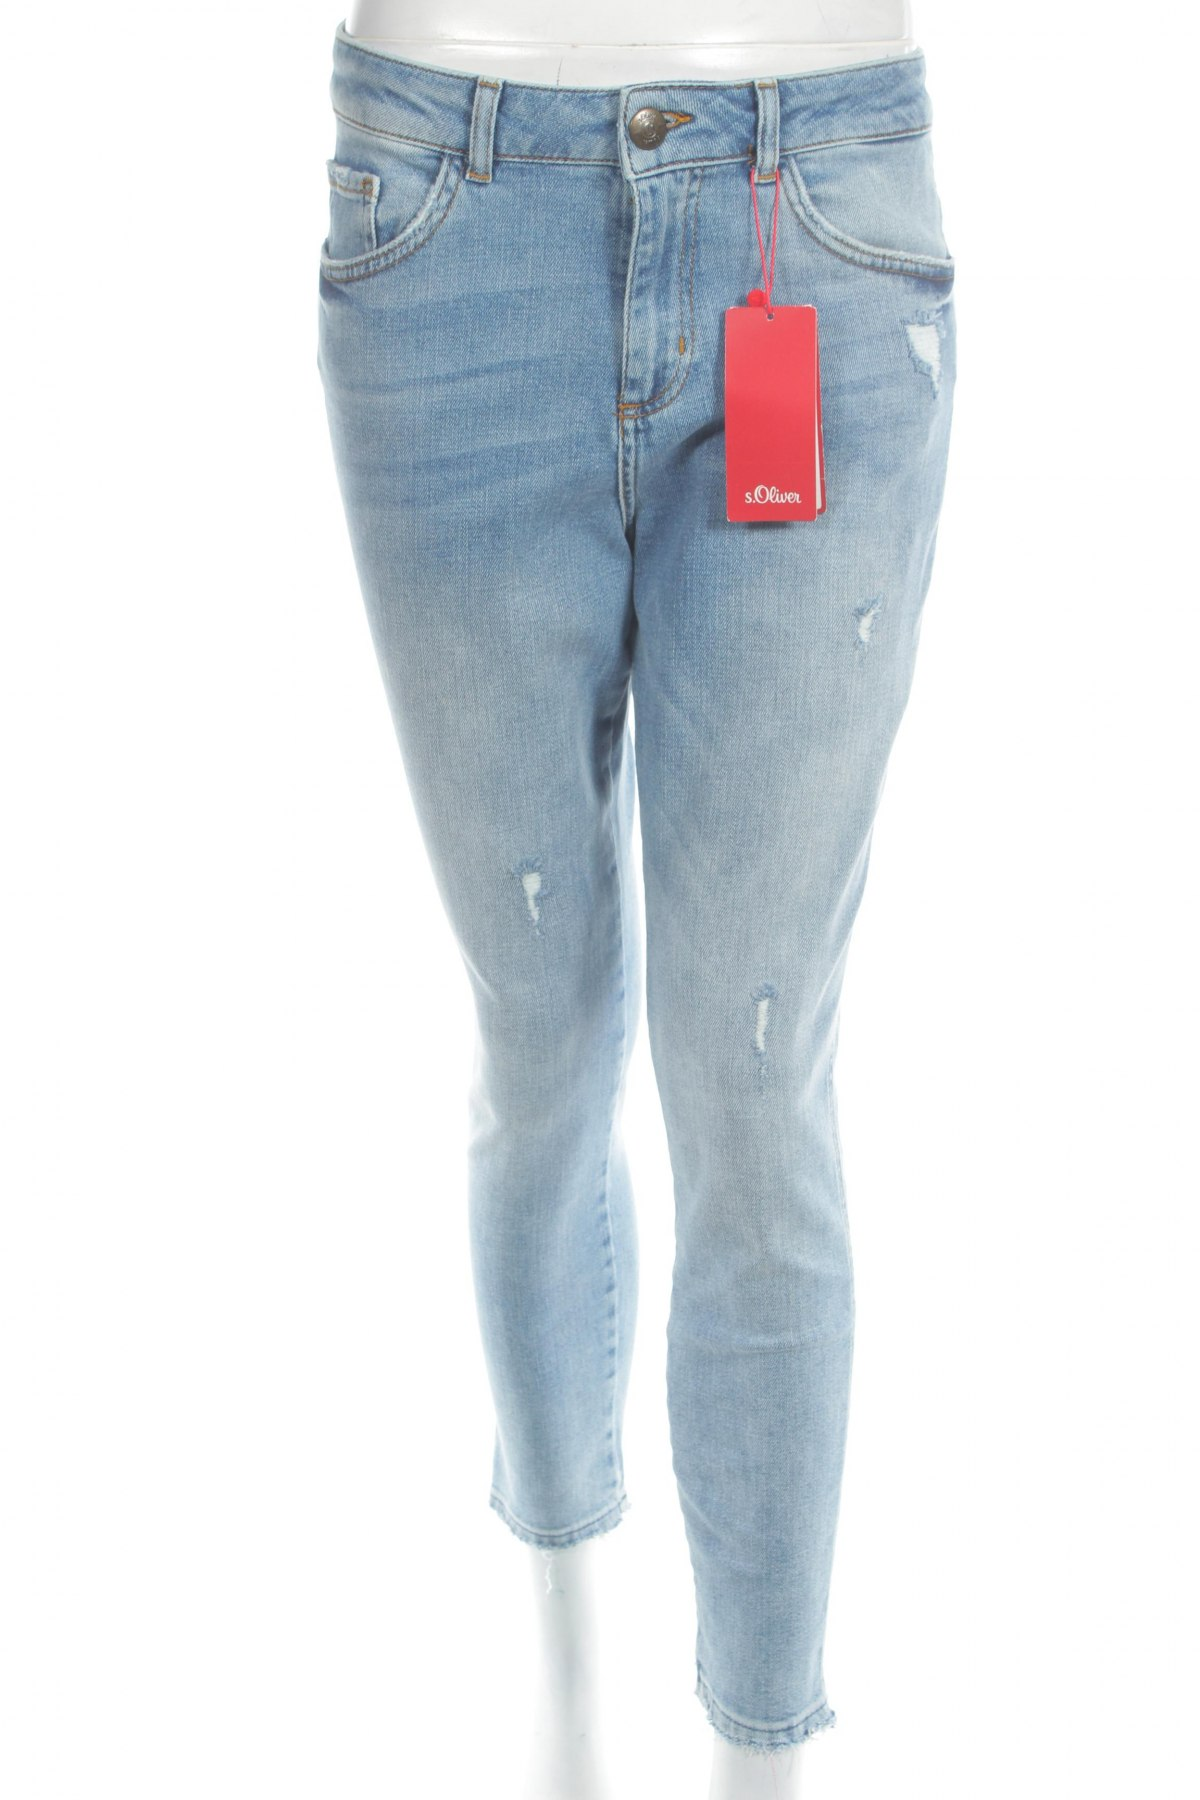 jeans s oliver